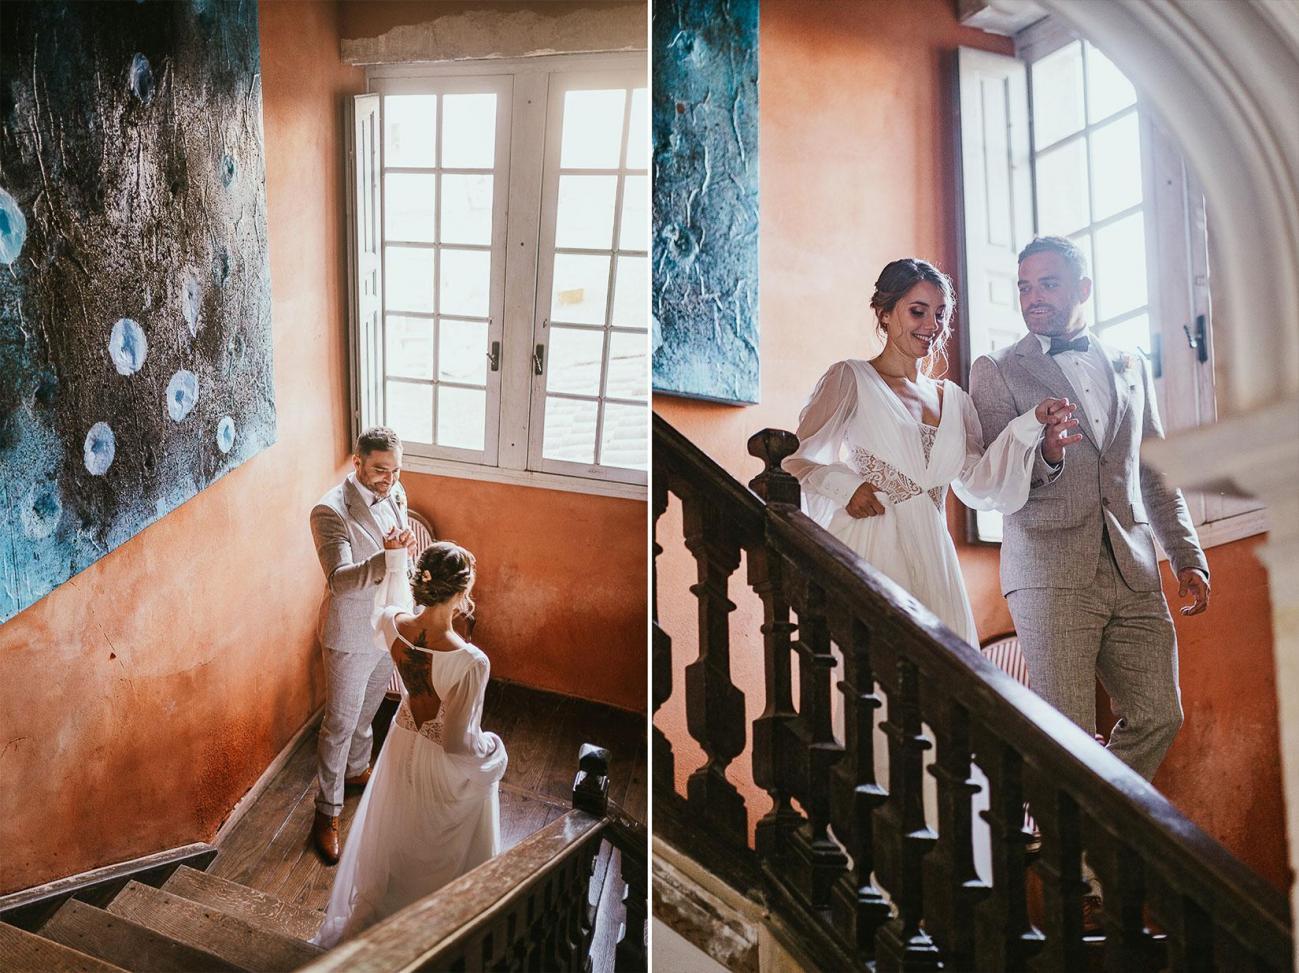 Mariage landes photographe inspiration elopement rustique wedding 84